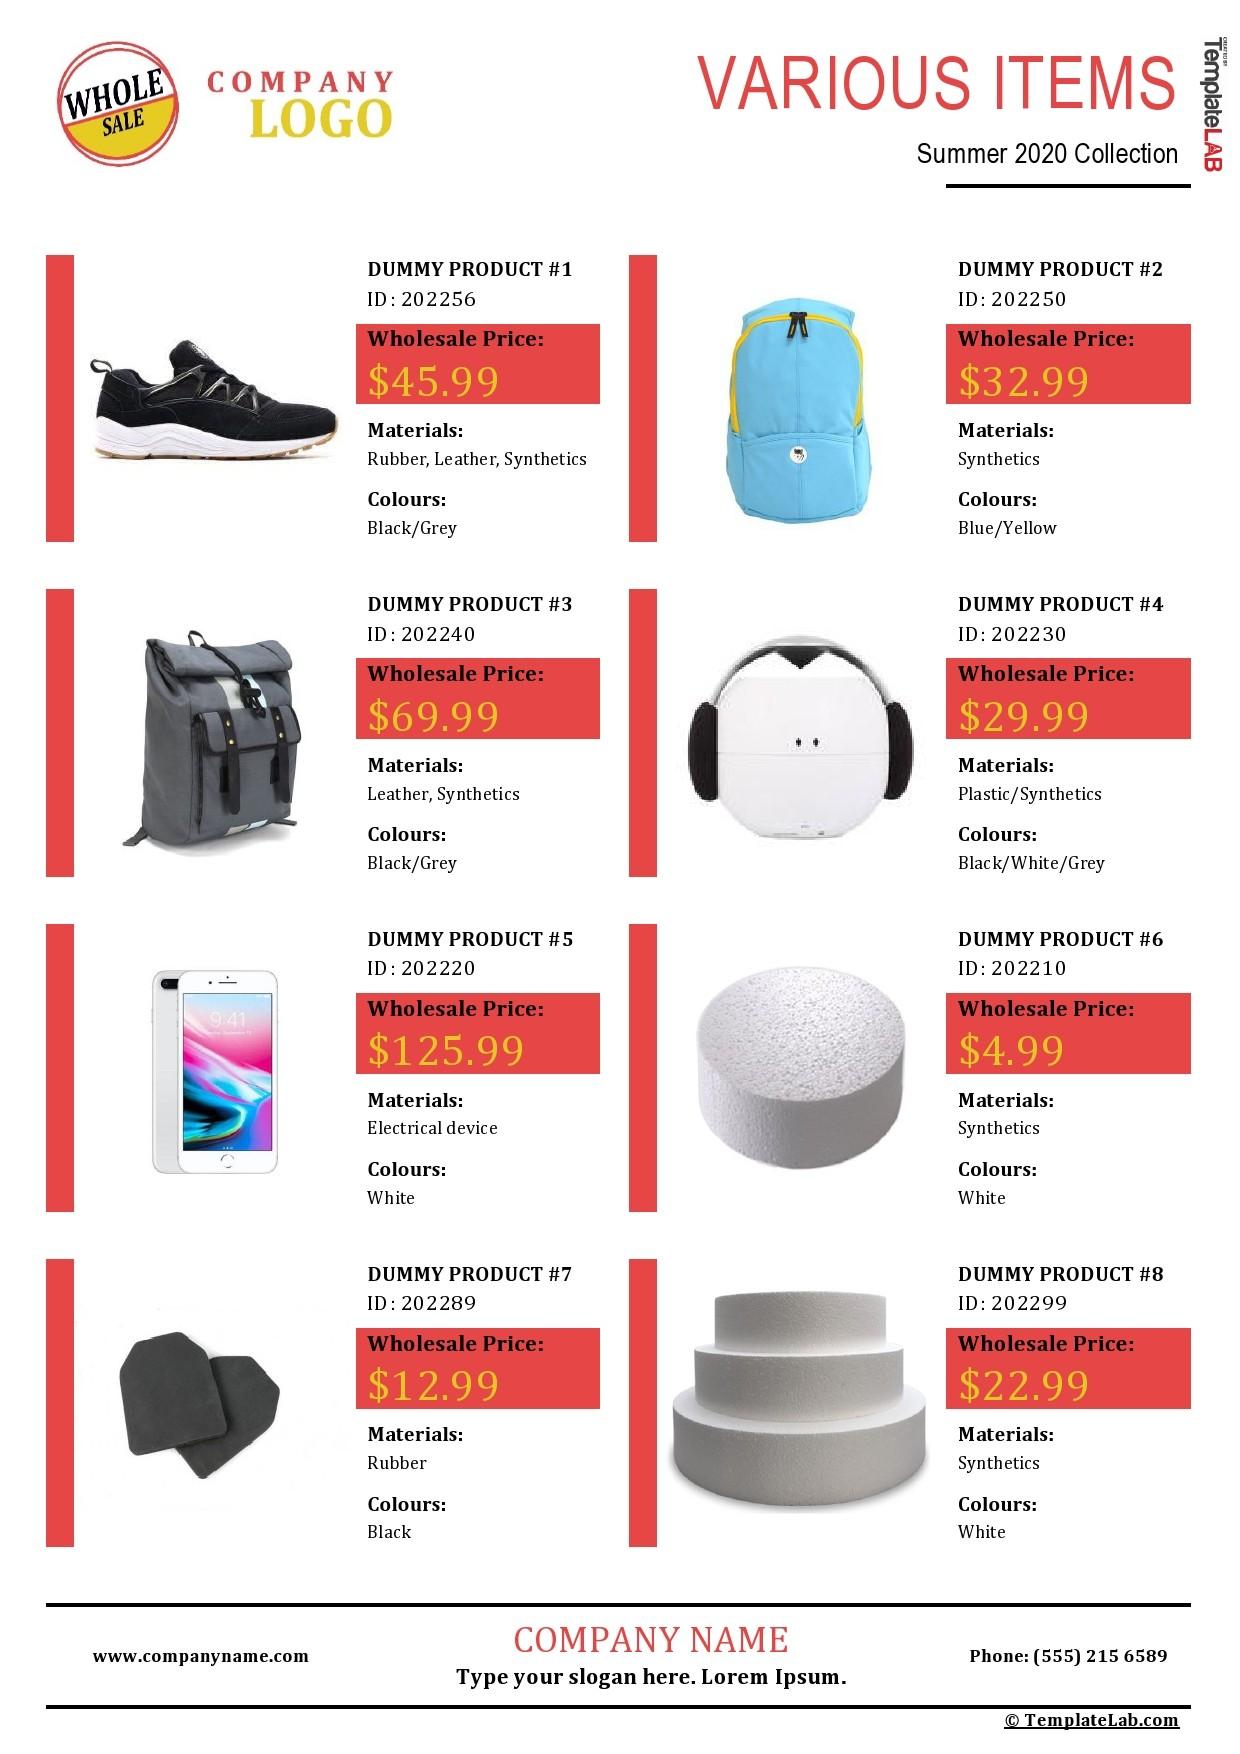 Free Wholesale Price List Template - TemplateLab.com